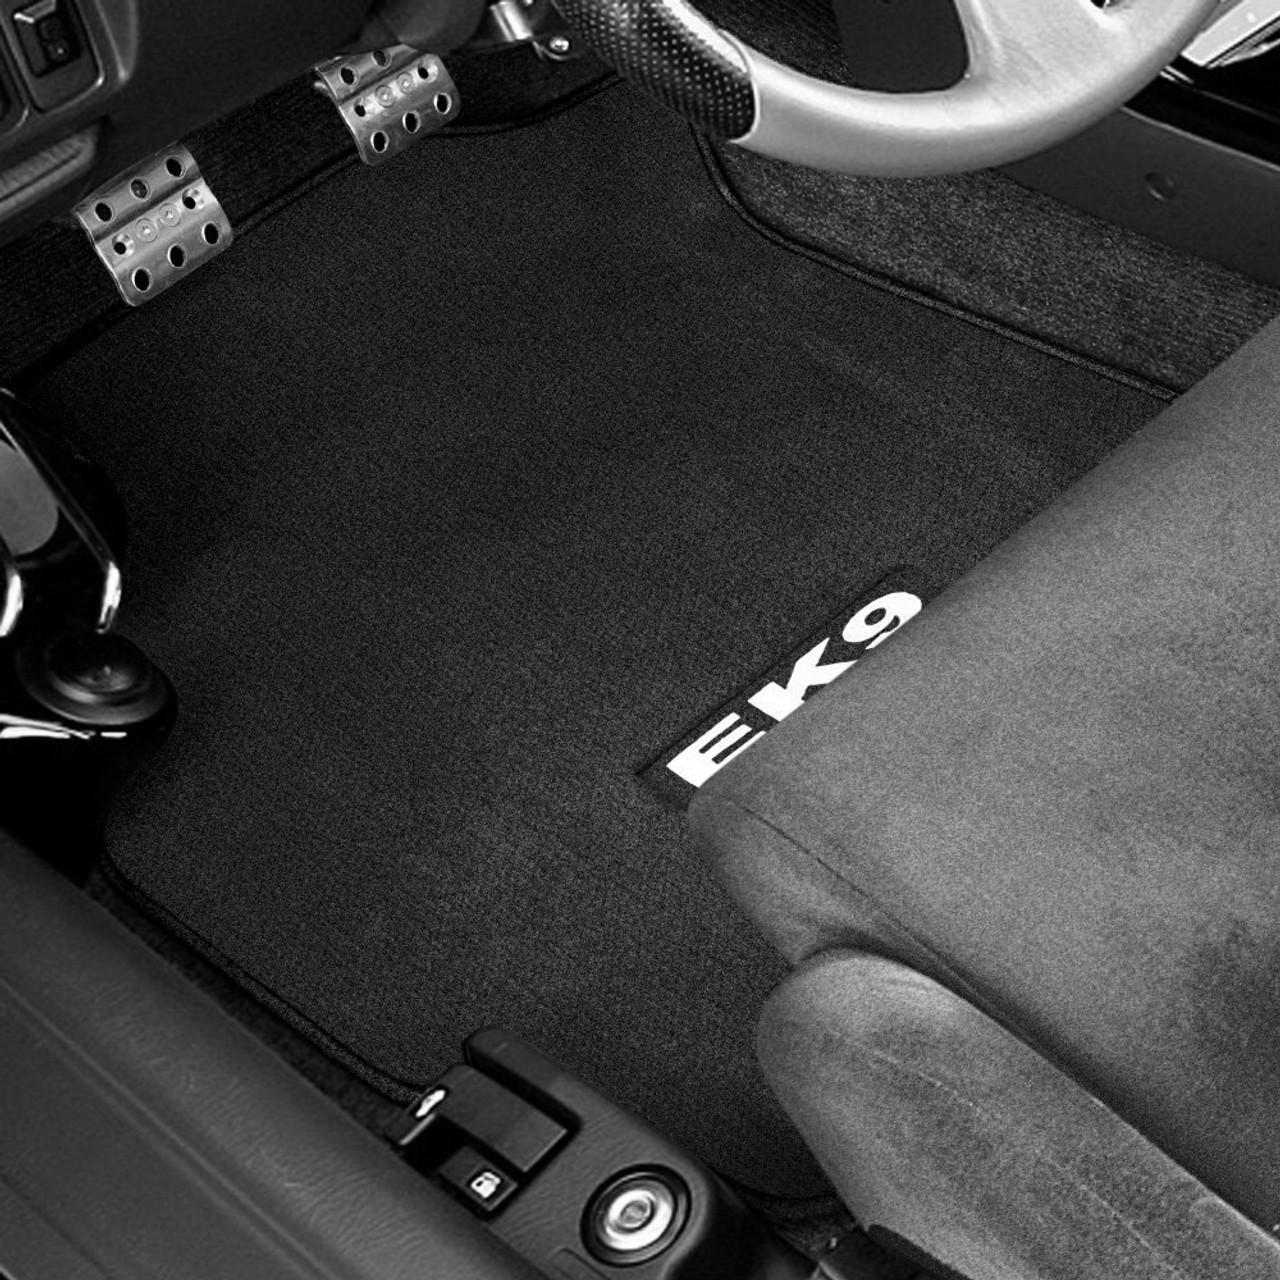 NRG - NRG Floor Carpet Mats Black Factory Fit